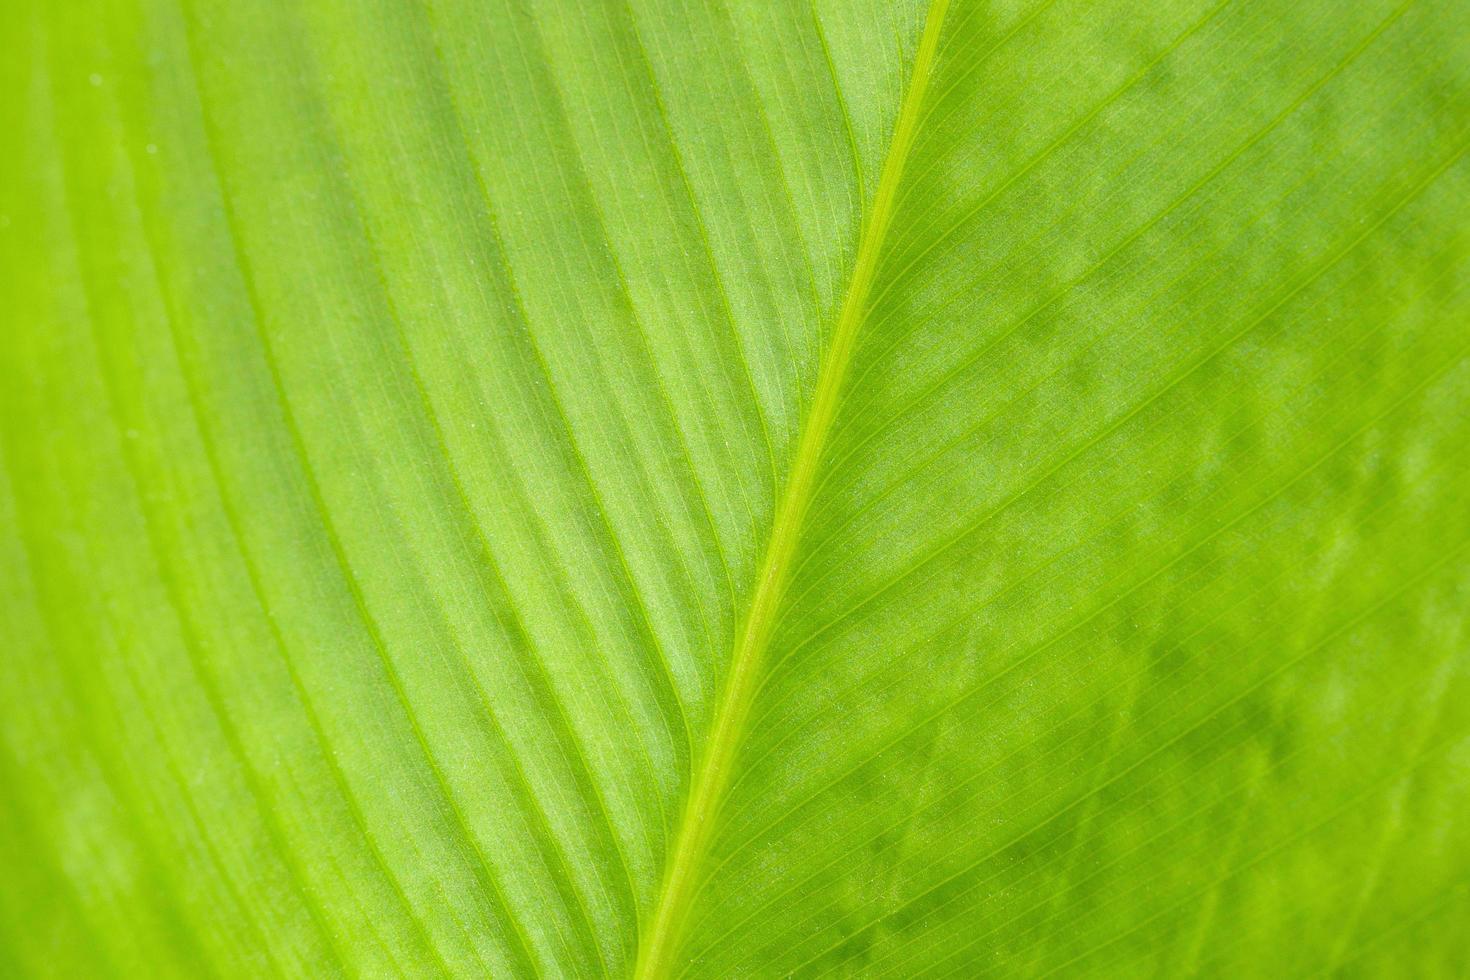 grünes Blattmuster, abstrakter Naturhintergrund. Nahaufnahme. foto